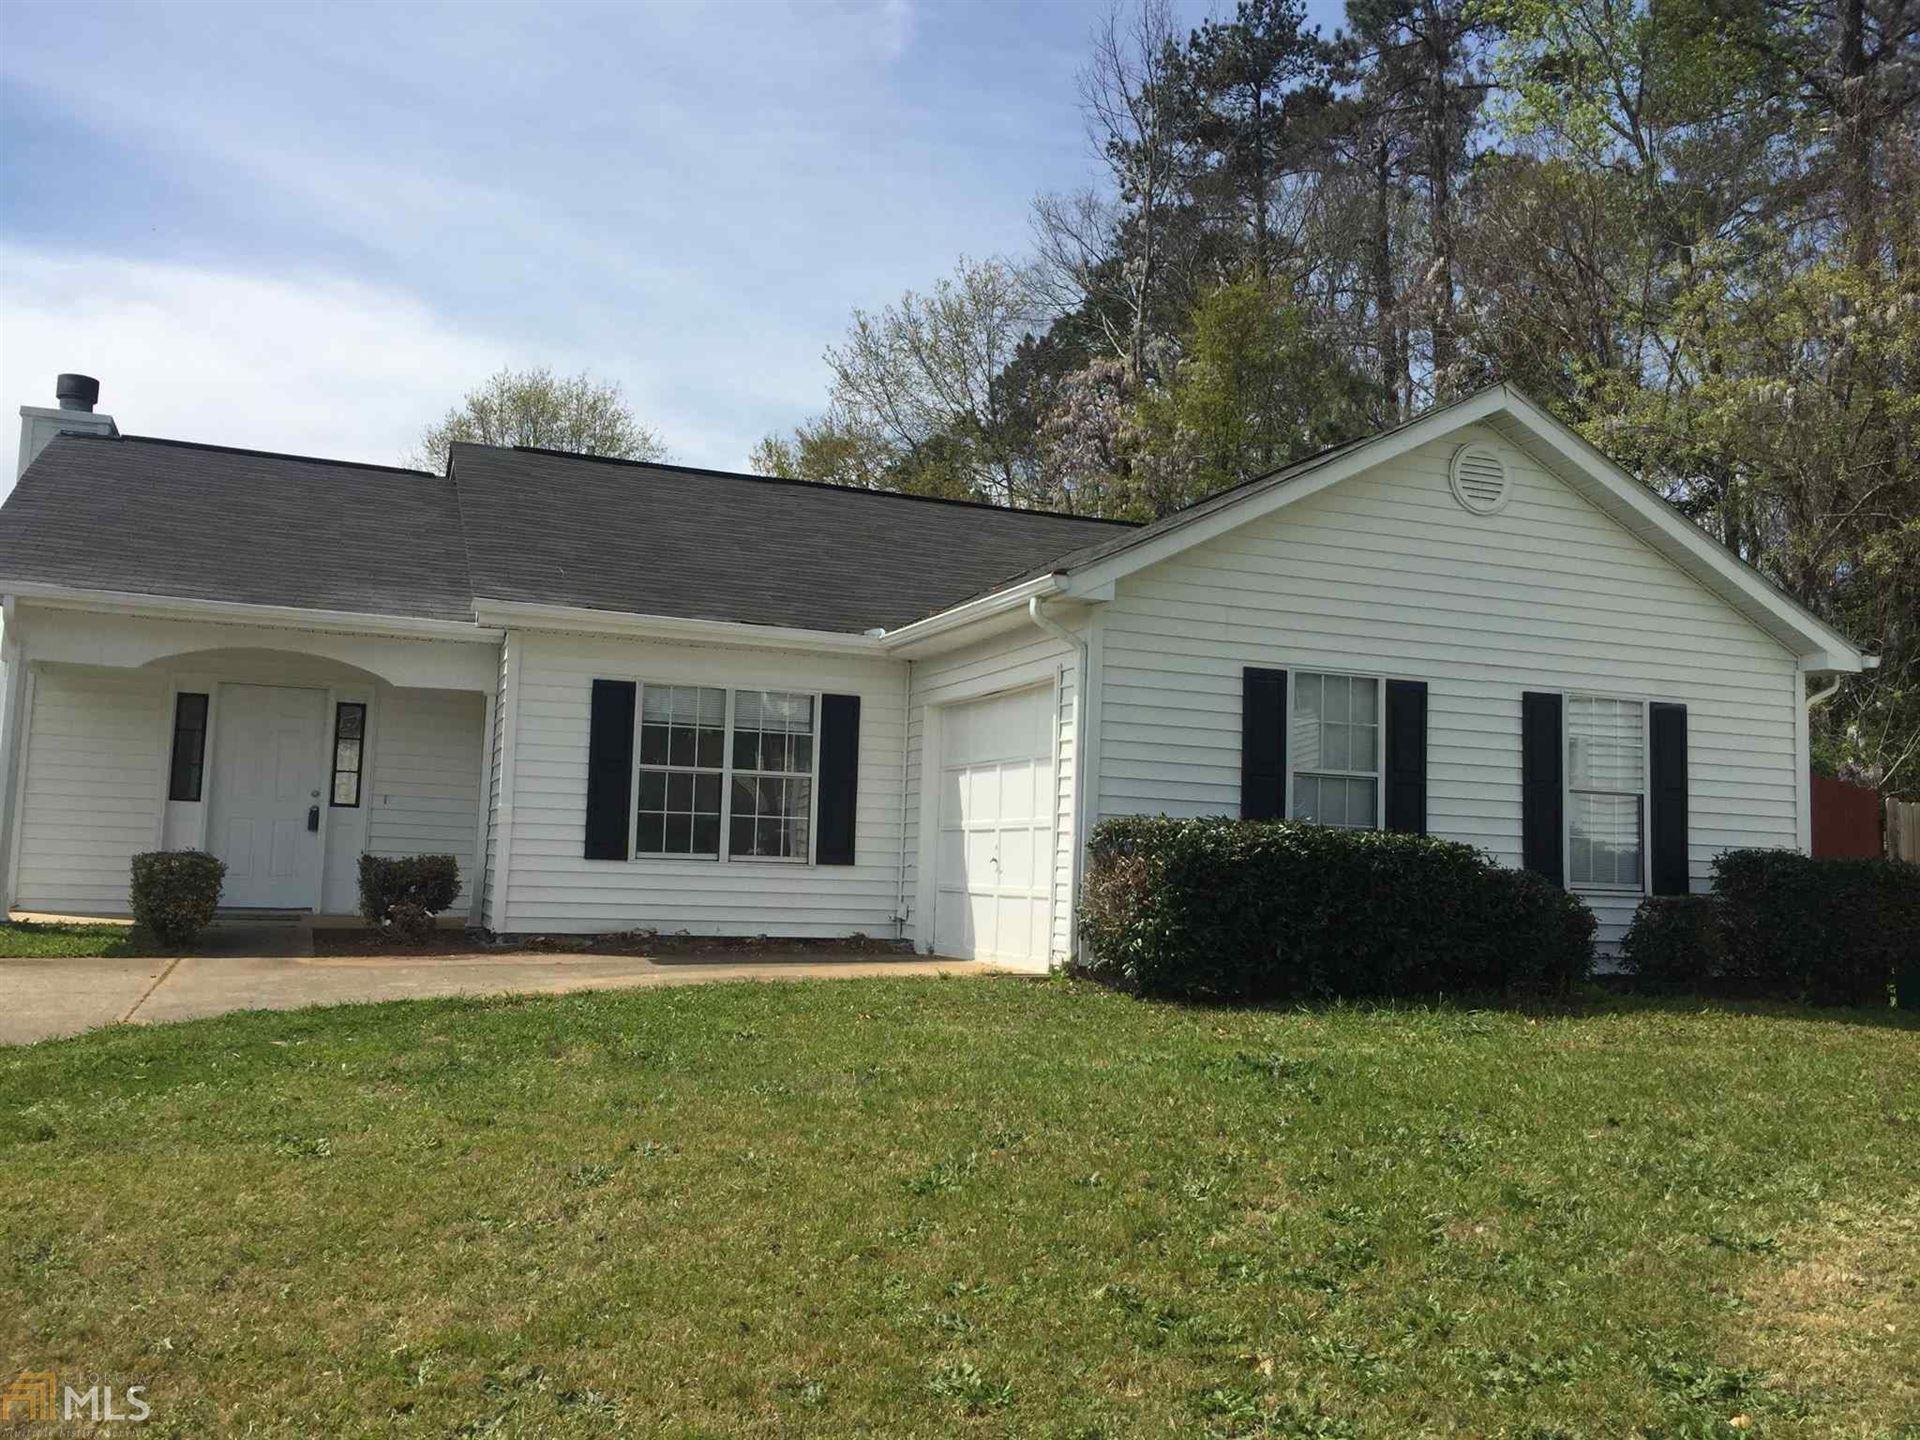 1611 Sweetgum Hill, Decatur, GA 30032 - #: 8956577